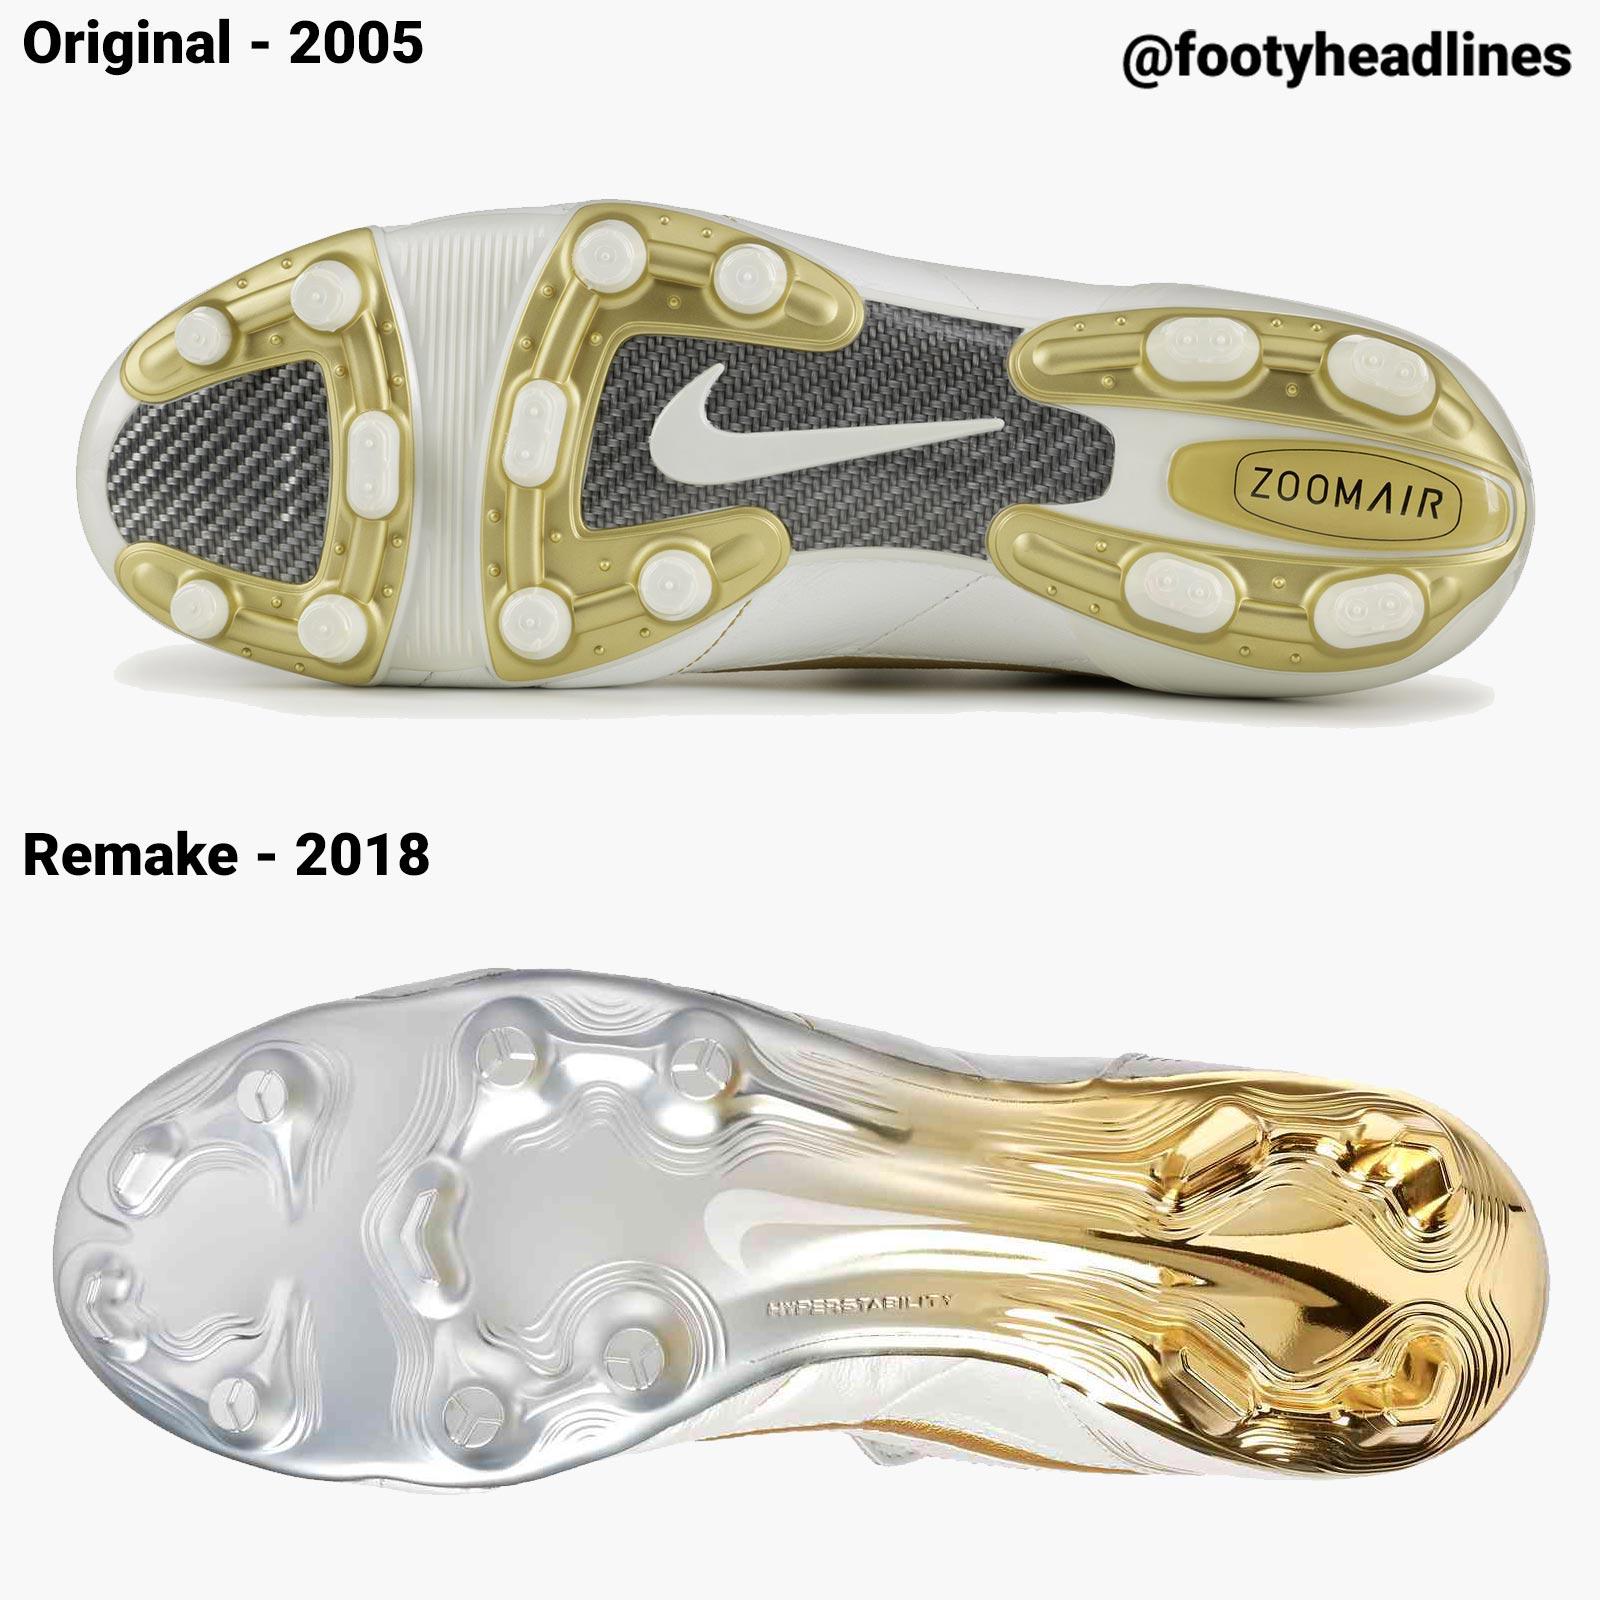 huge discount 87897 f45b1 Nike Air Legend Tiempo Ronaldinho - 2018 Remake vs 2005 ...